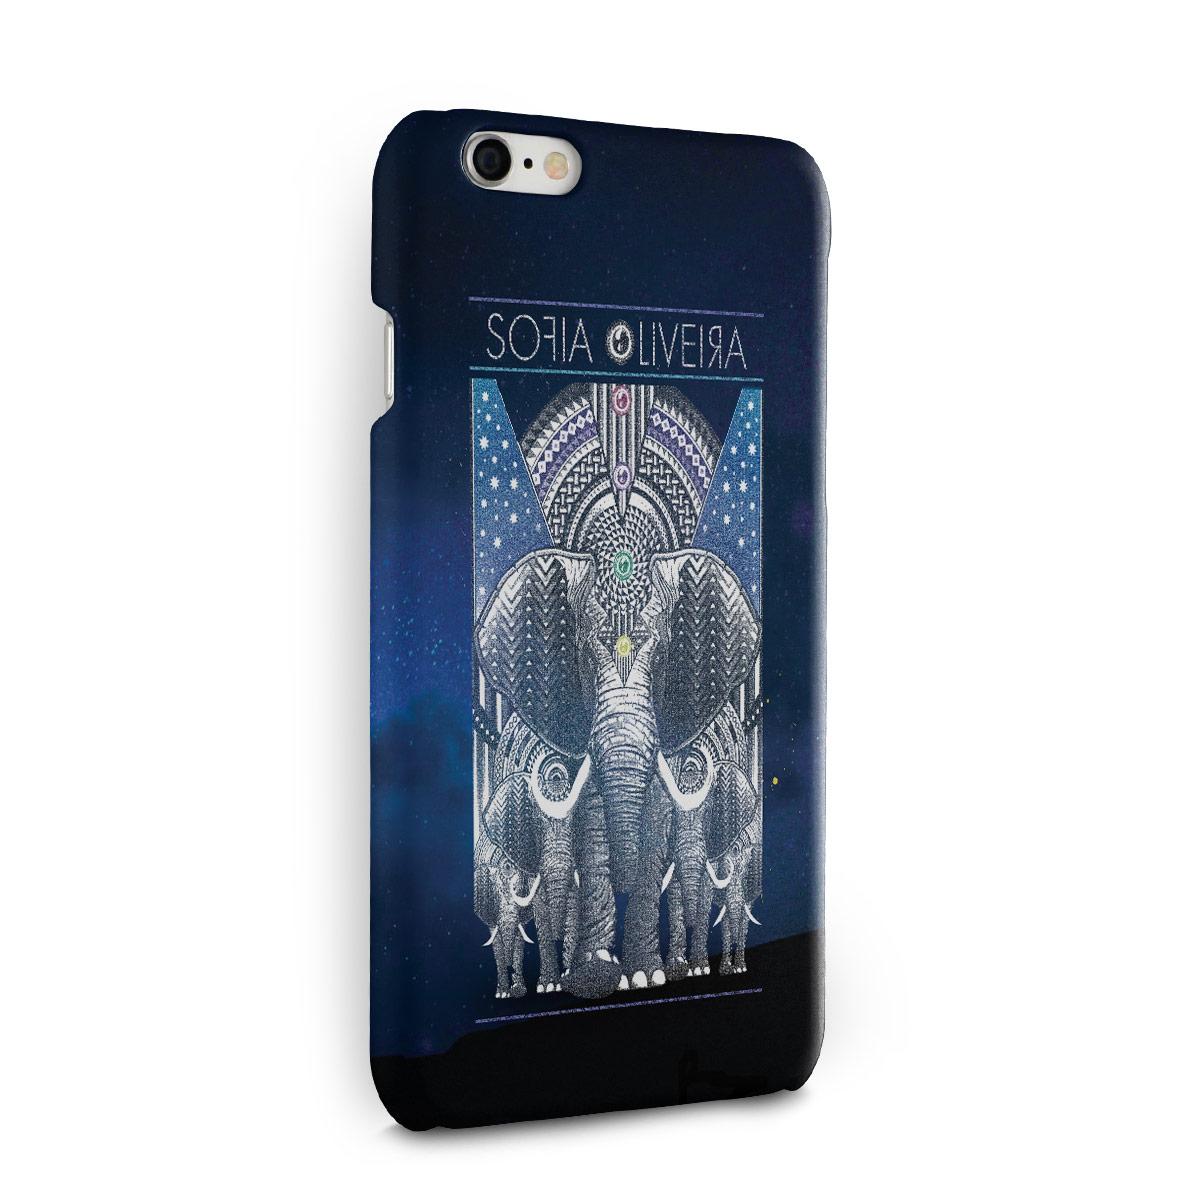 Capa para iPhone 6/6S Sofia Oliveira Elephant